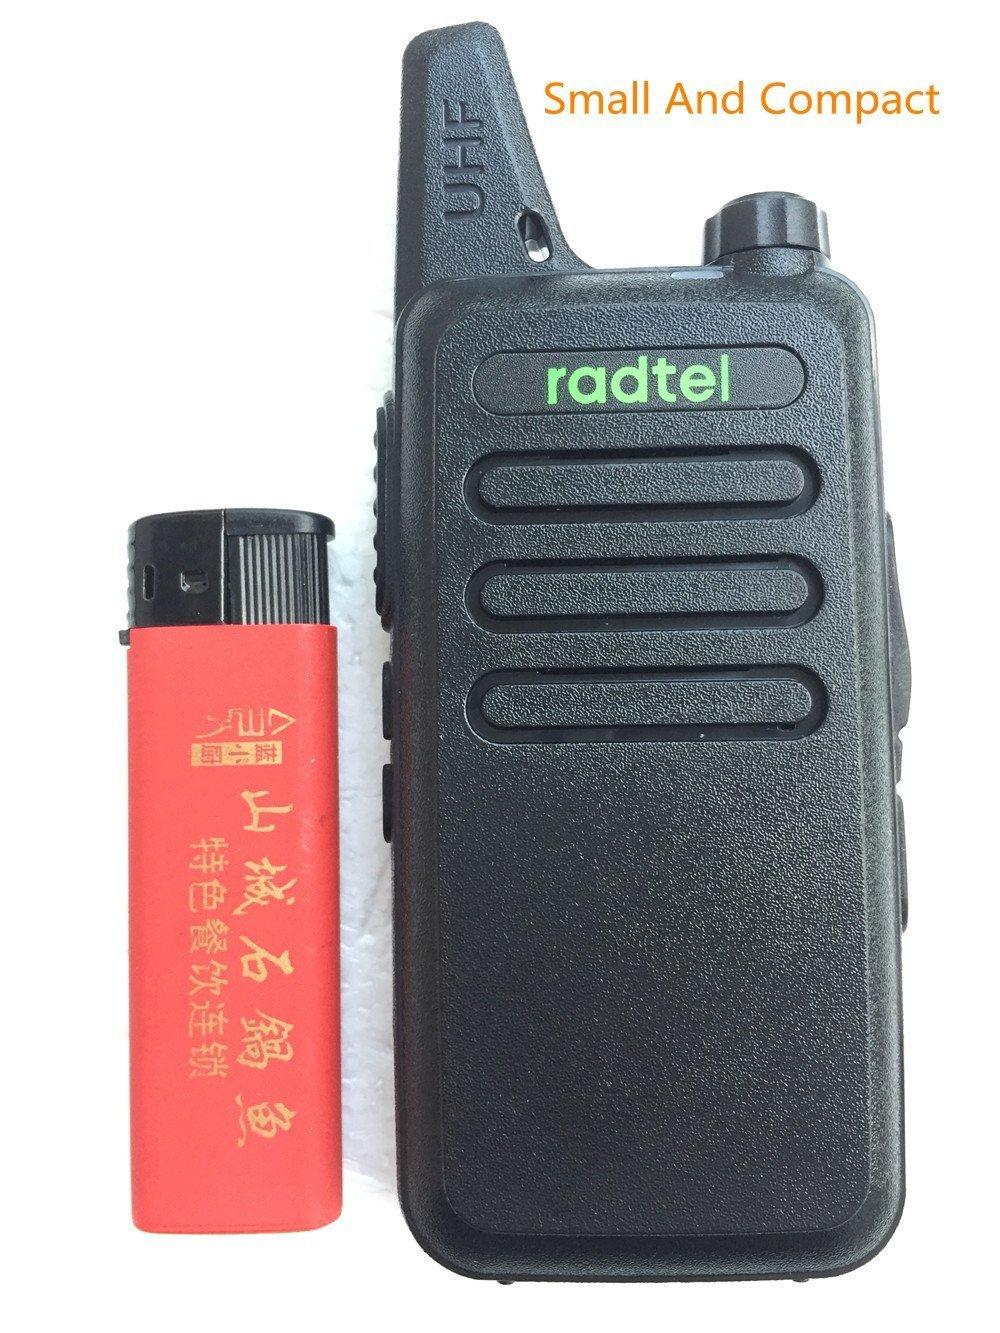 Radtel RT-10 Mini Two Way Radio UHF 400-470Mhz 3W Kid's Walkie Talkie , for Outdoor Camping Hiking Hunting Gift (10 Pack) by radtel (Image #8)